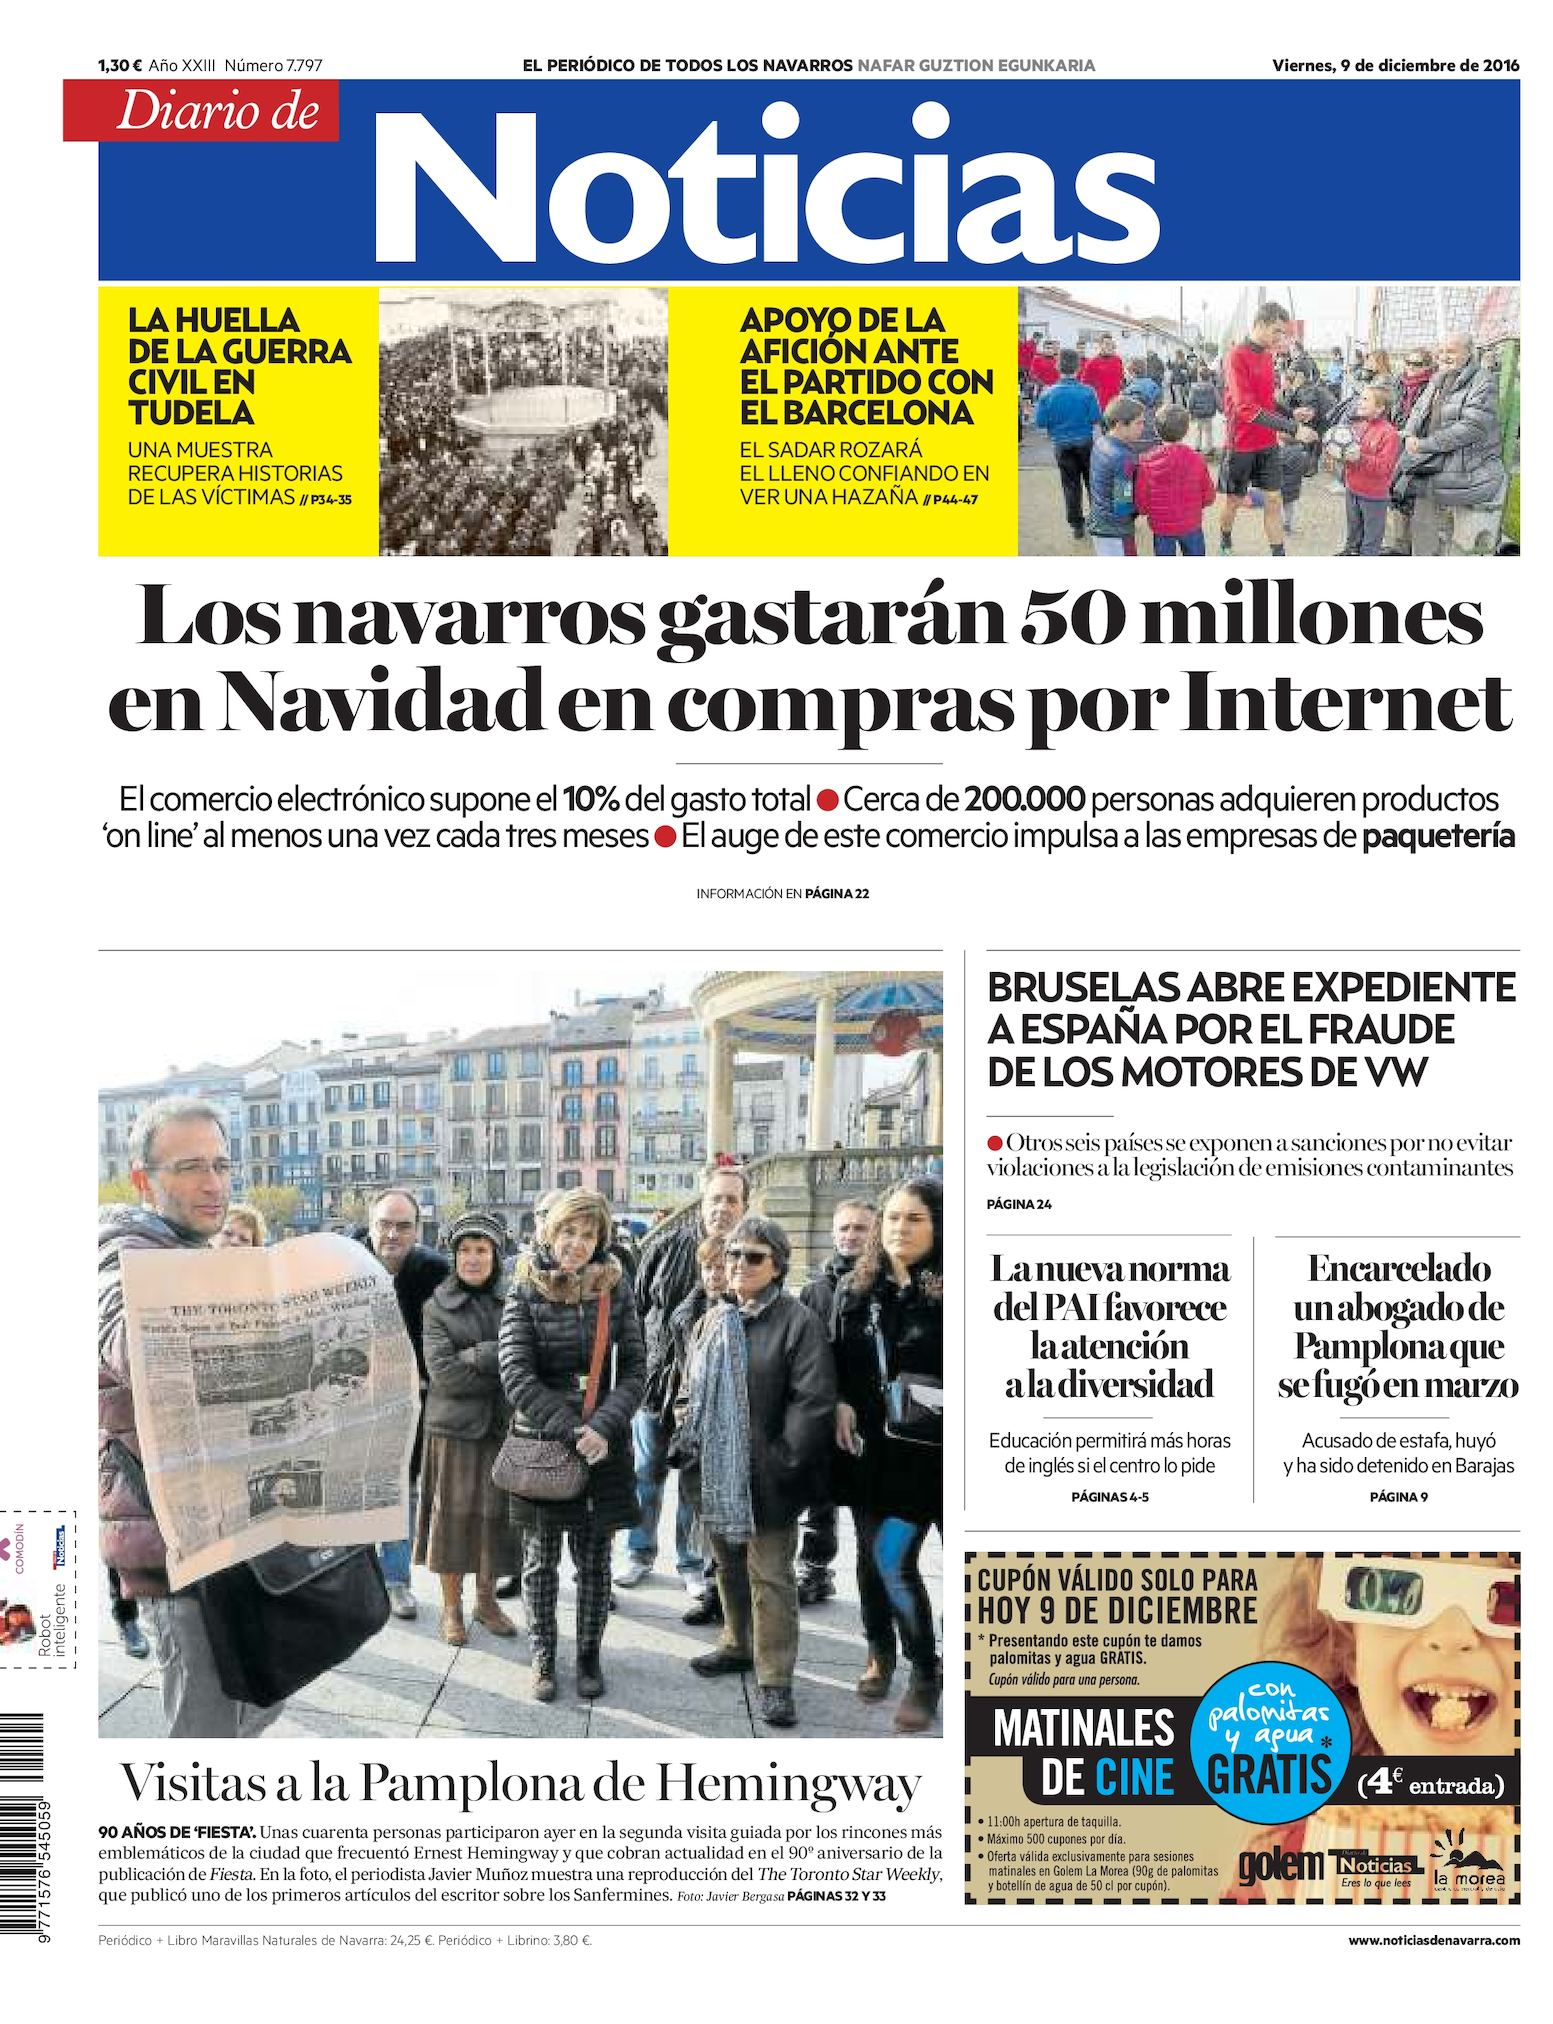 Calaméo - Diario de Noticias 20161209 c137e995af175